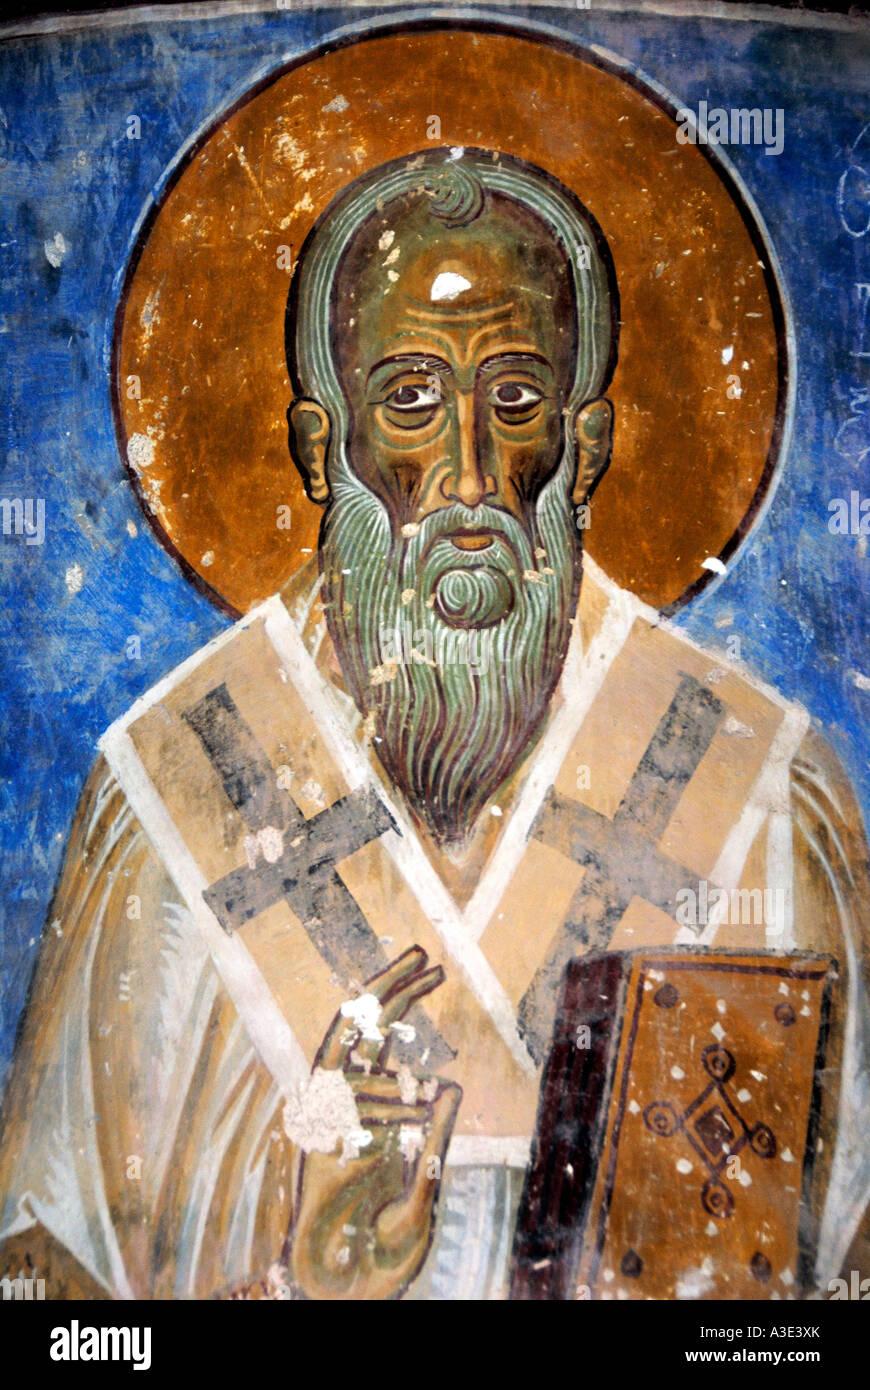 Byzantine Bishop Stock Photos Amp Byzantine Bishop Stock